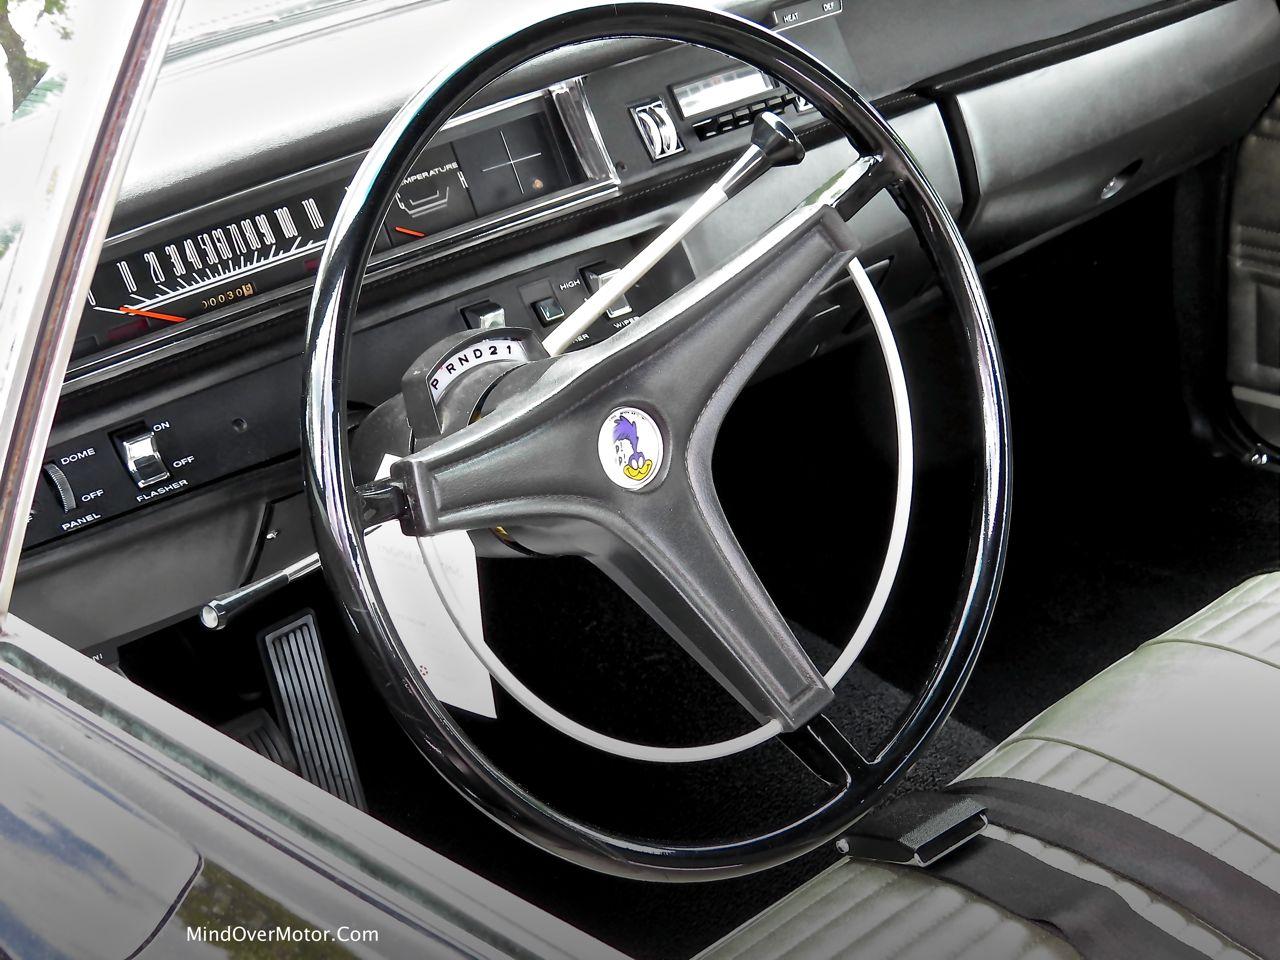 1969 Plymouth Road Runner 440+6 Interior